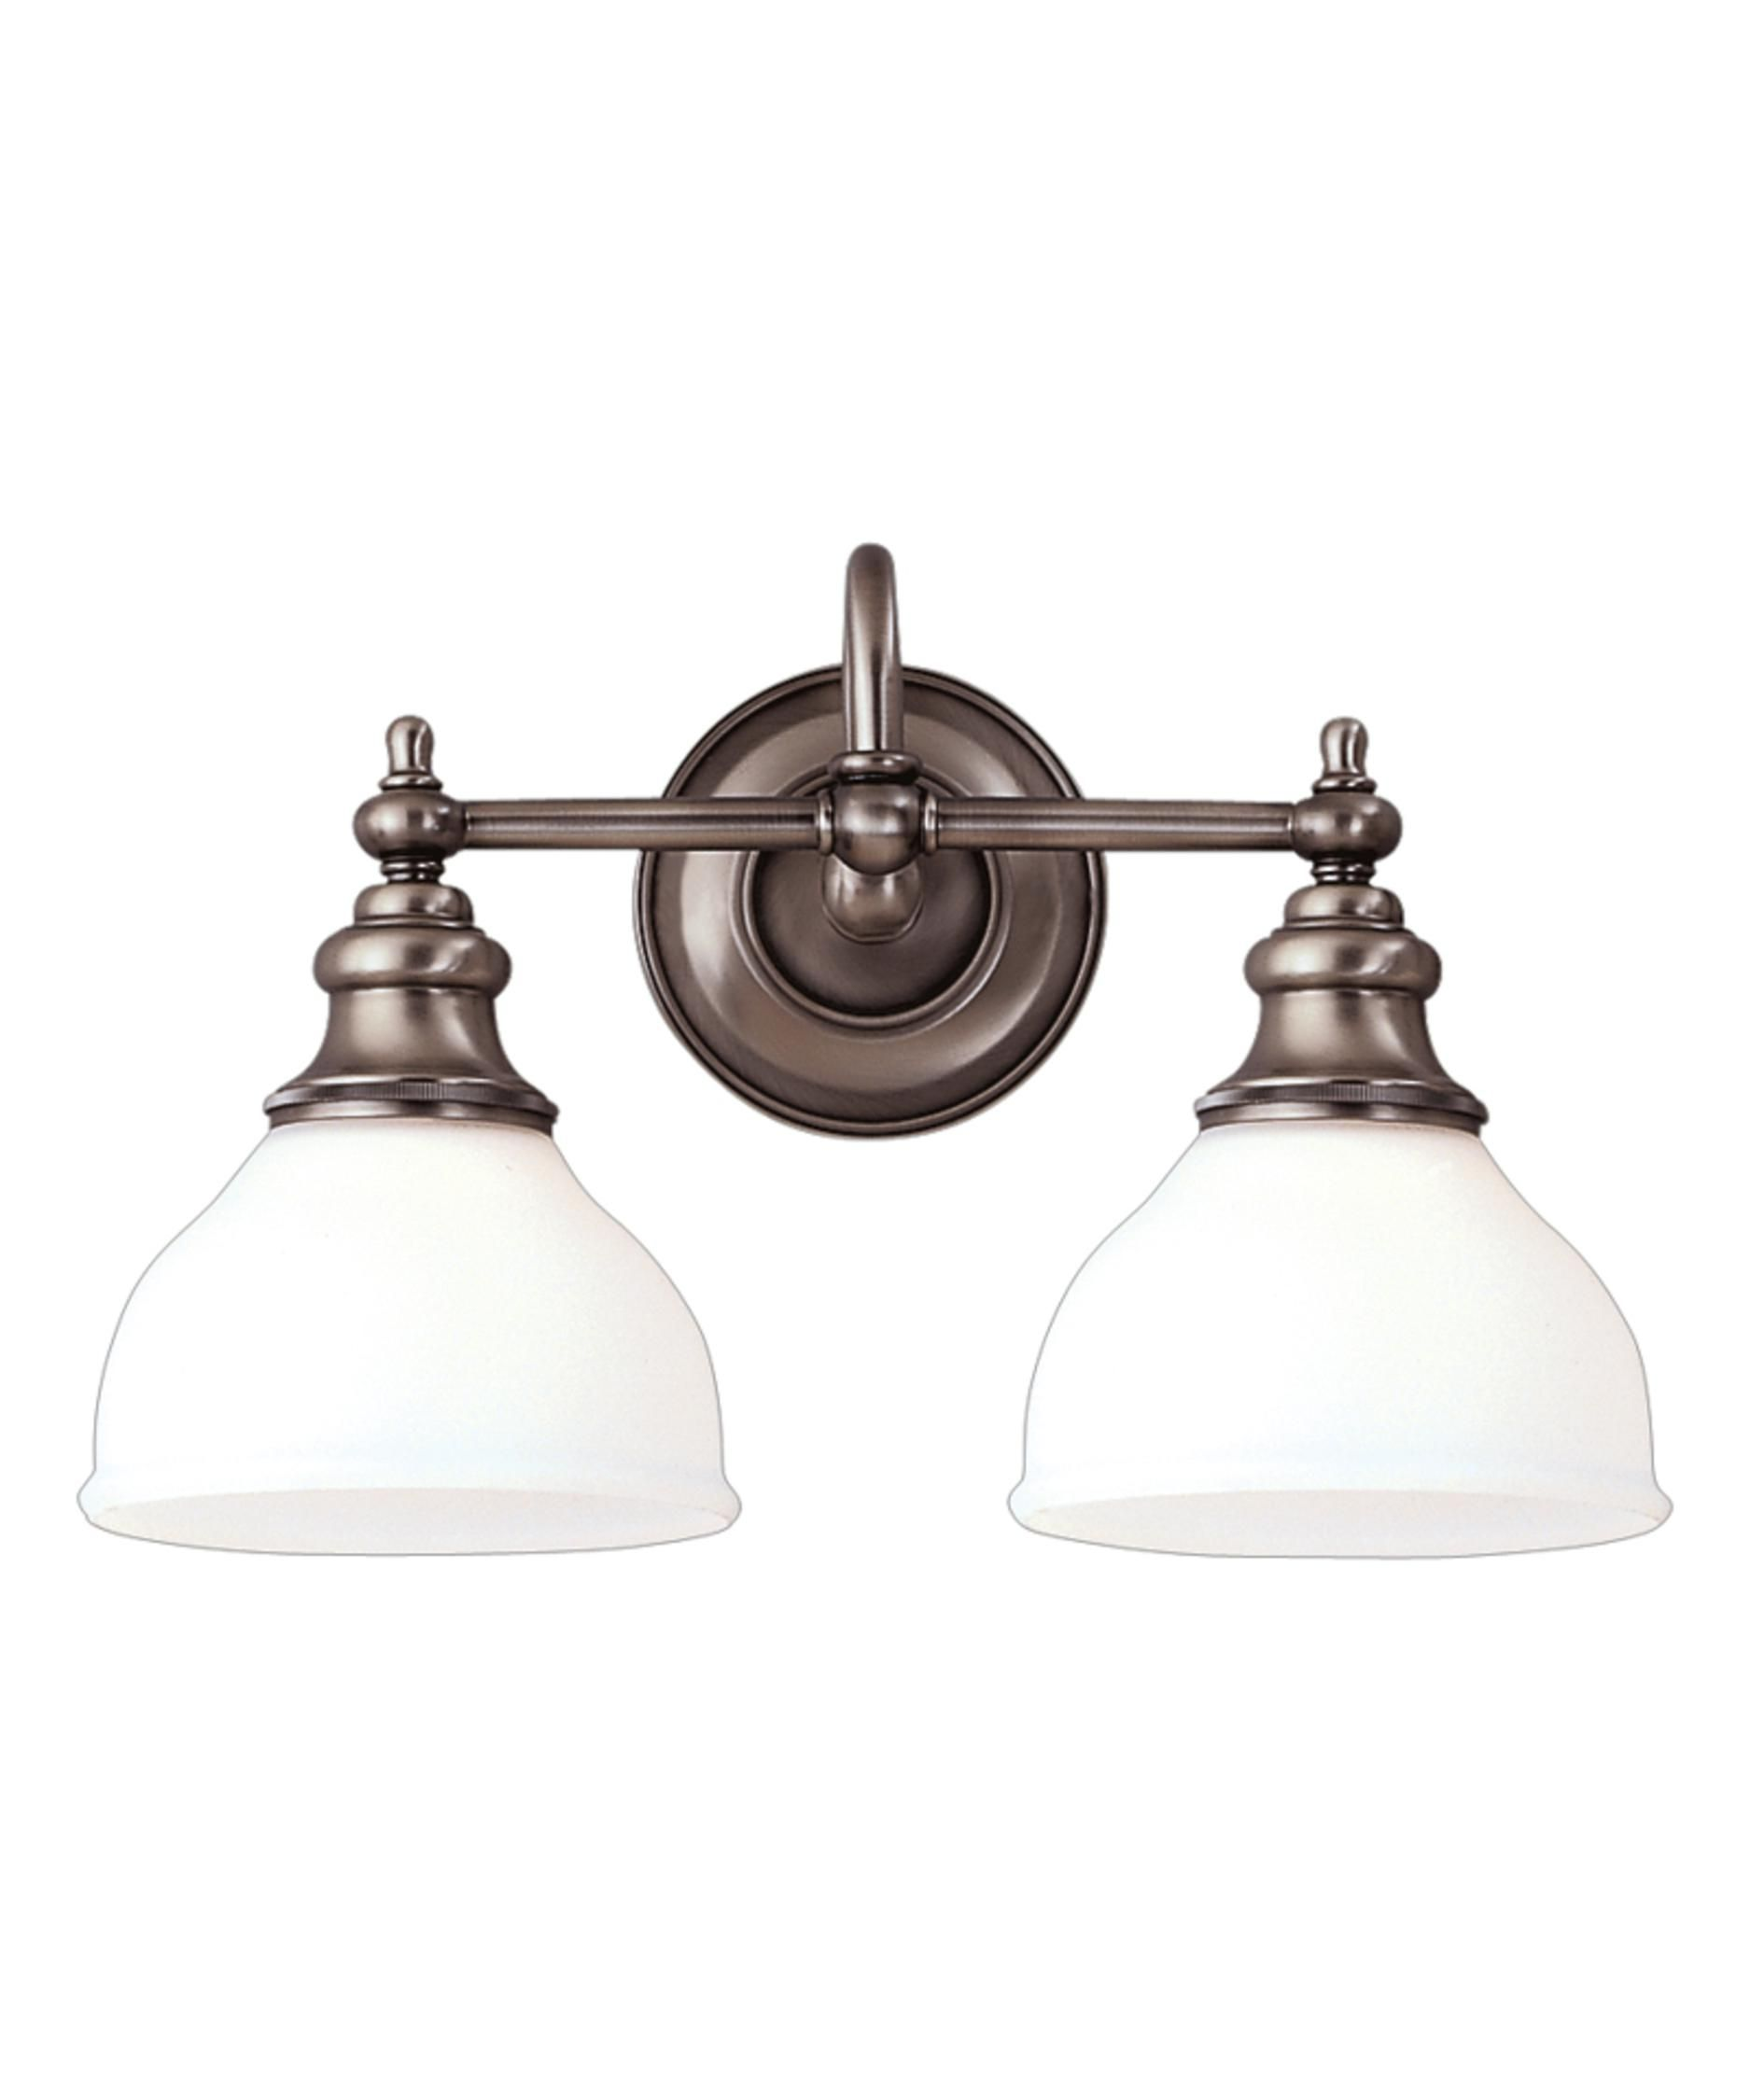 Hudson Valley Sutton 16 Inch Wide Bath Vanity Light  Hudson Prepossessing Vintage Bathroom Vanity Lights Design Ideas